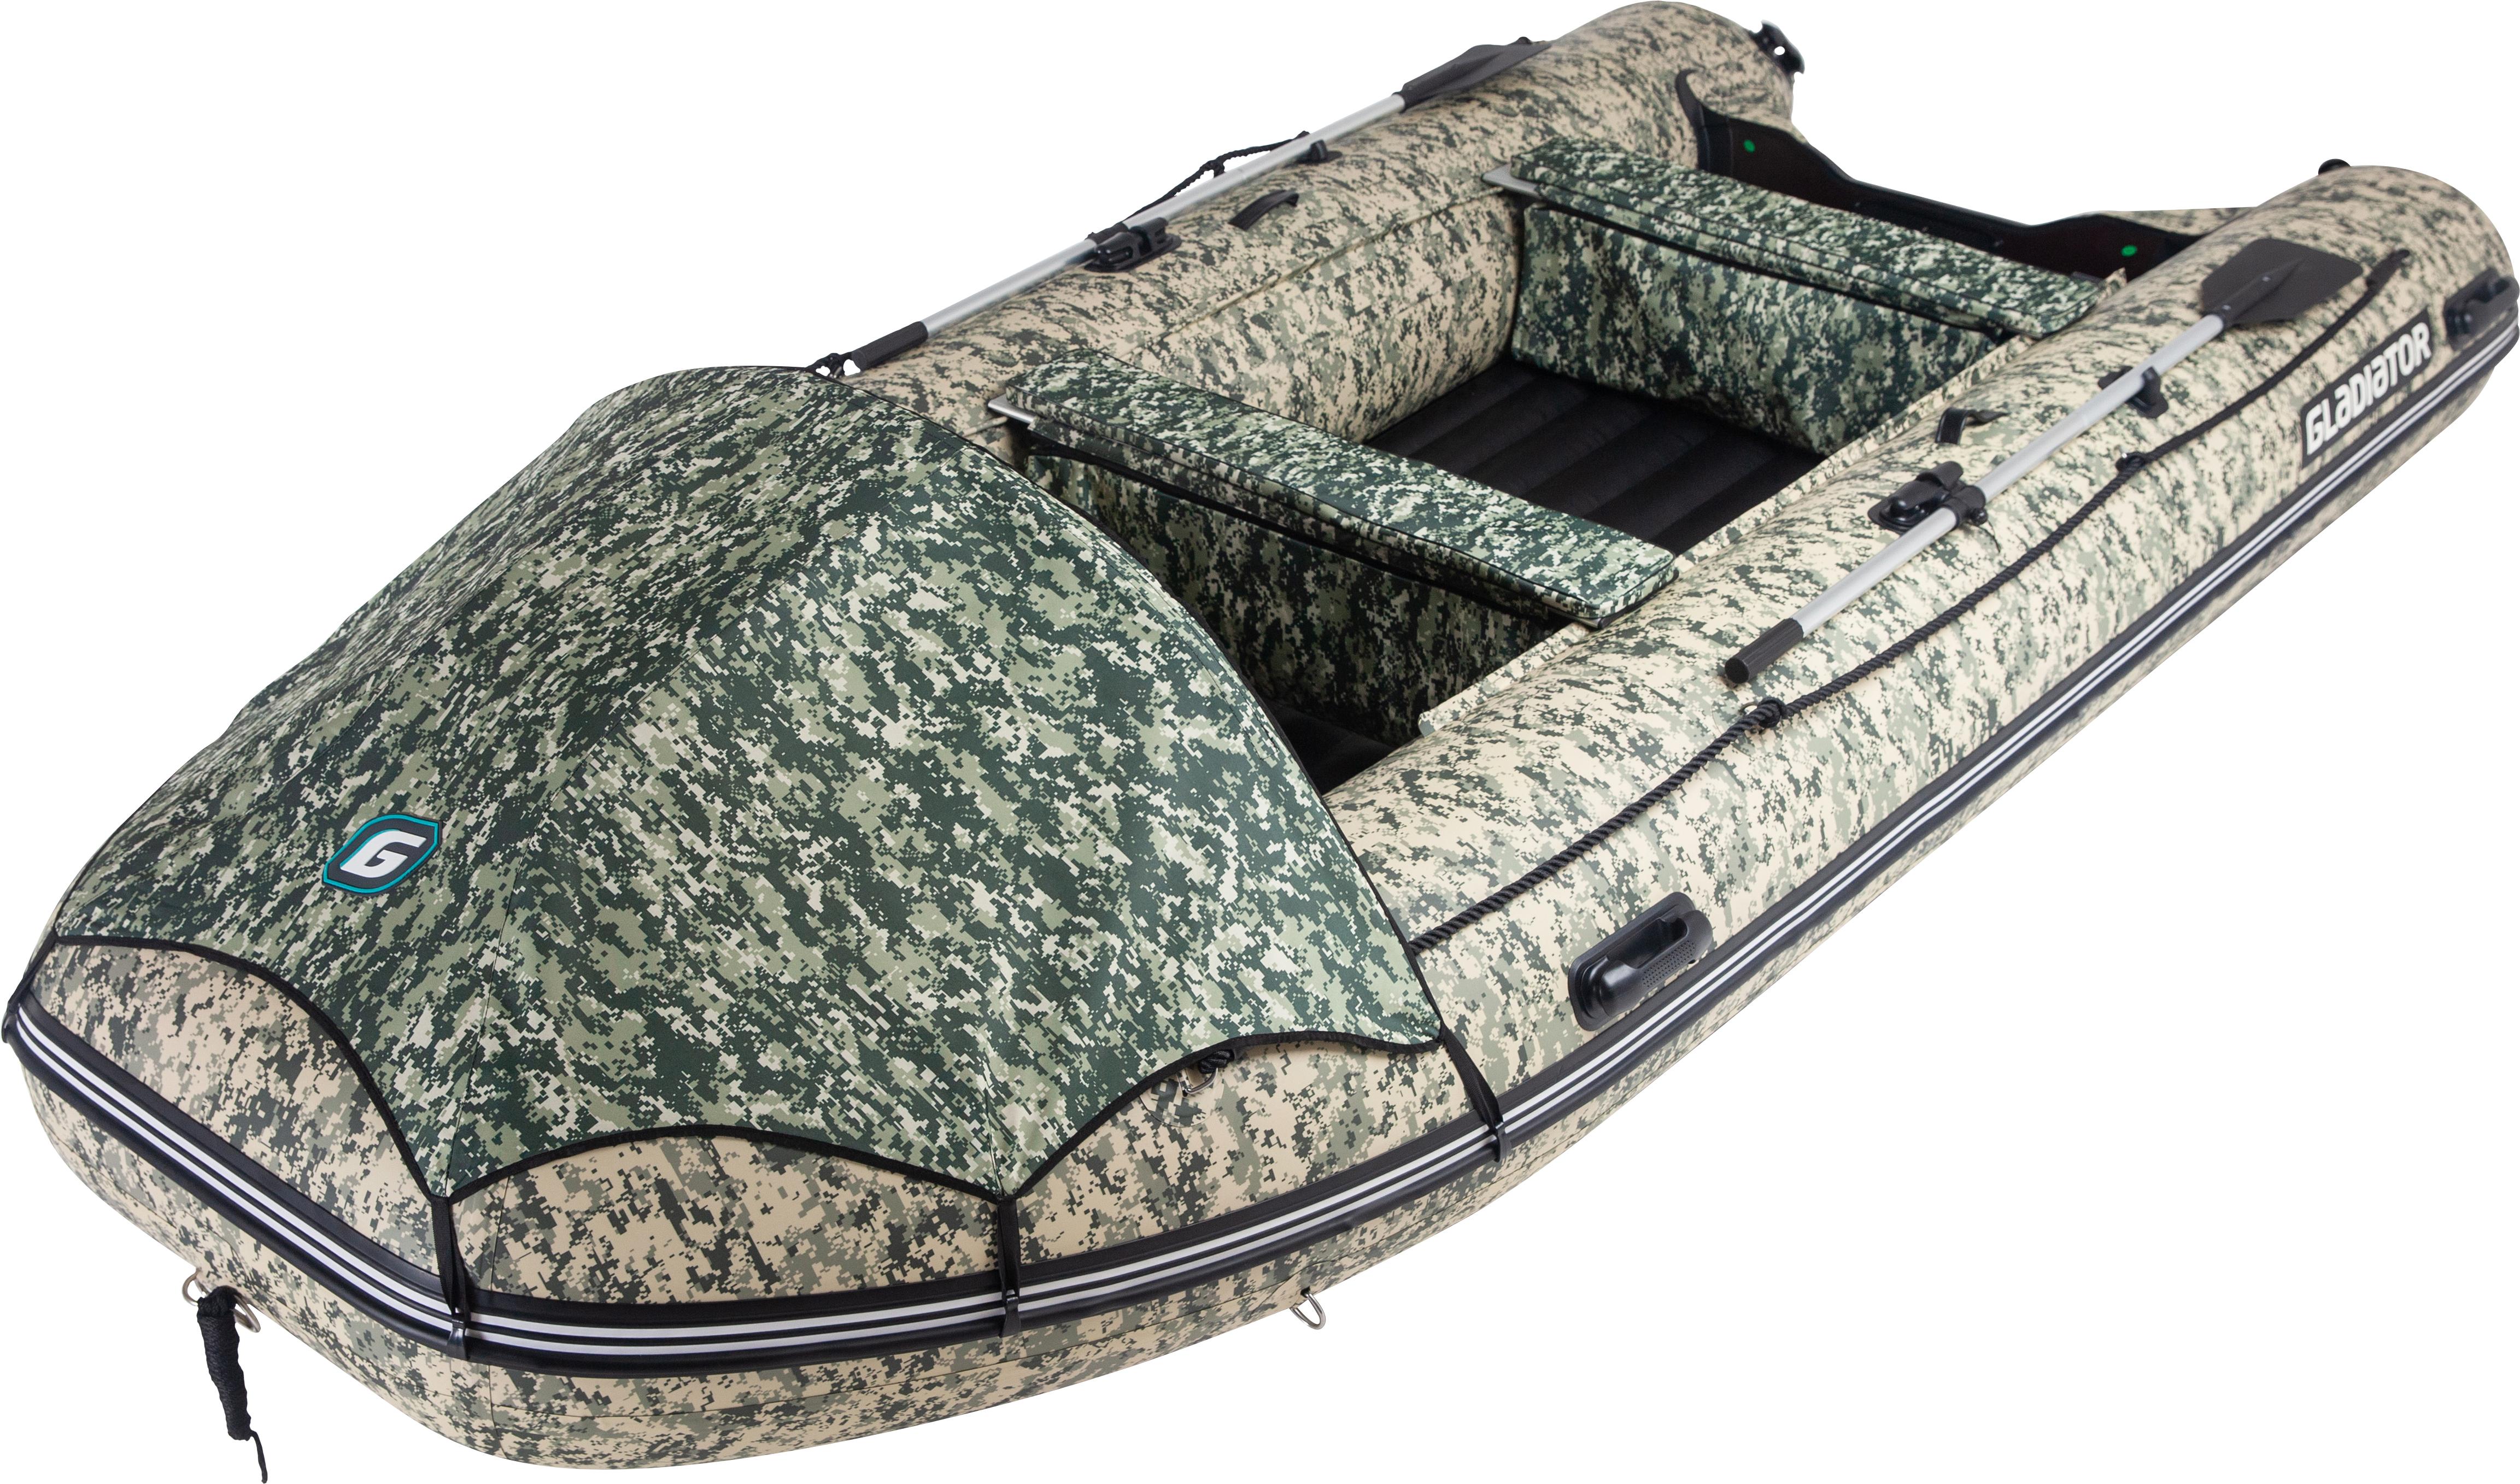 Лодка надувная Gladiator E 450 НДНД 4,5 x 2,04 м камуфляж